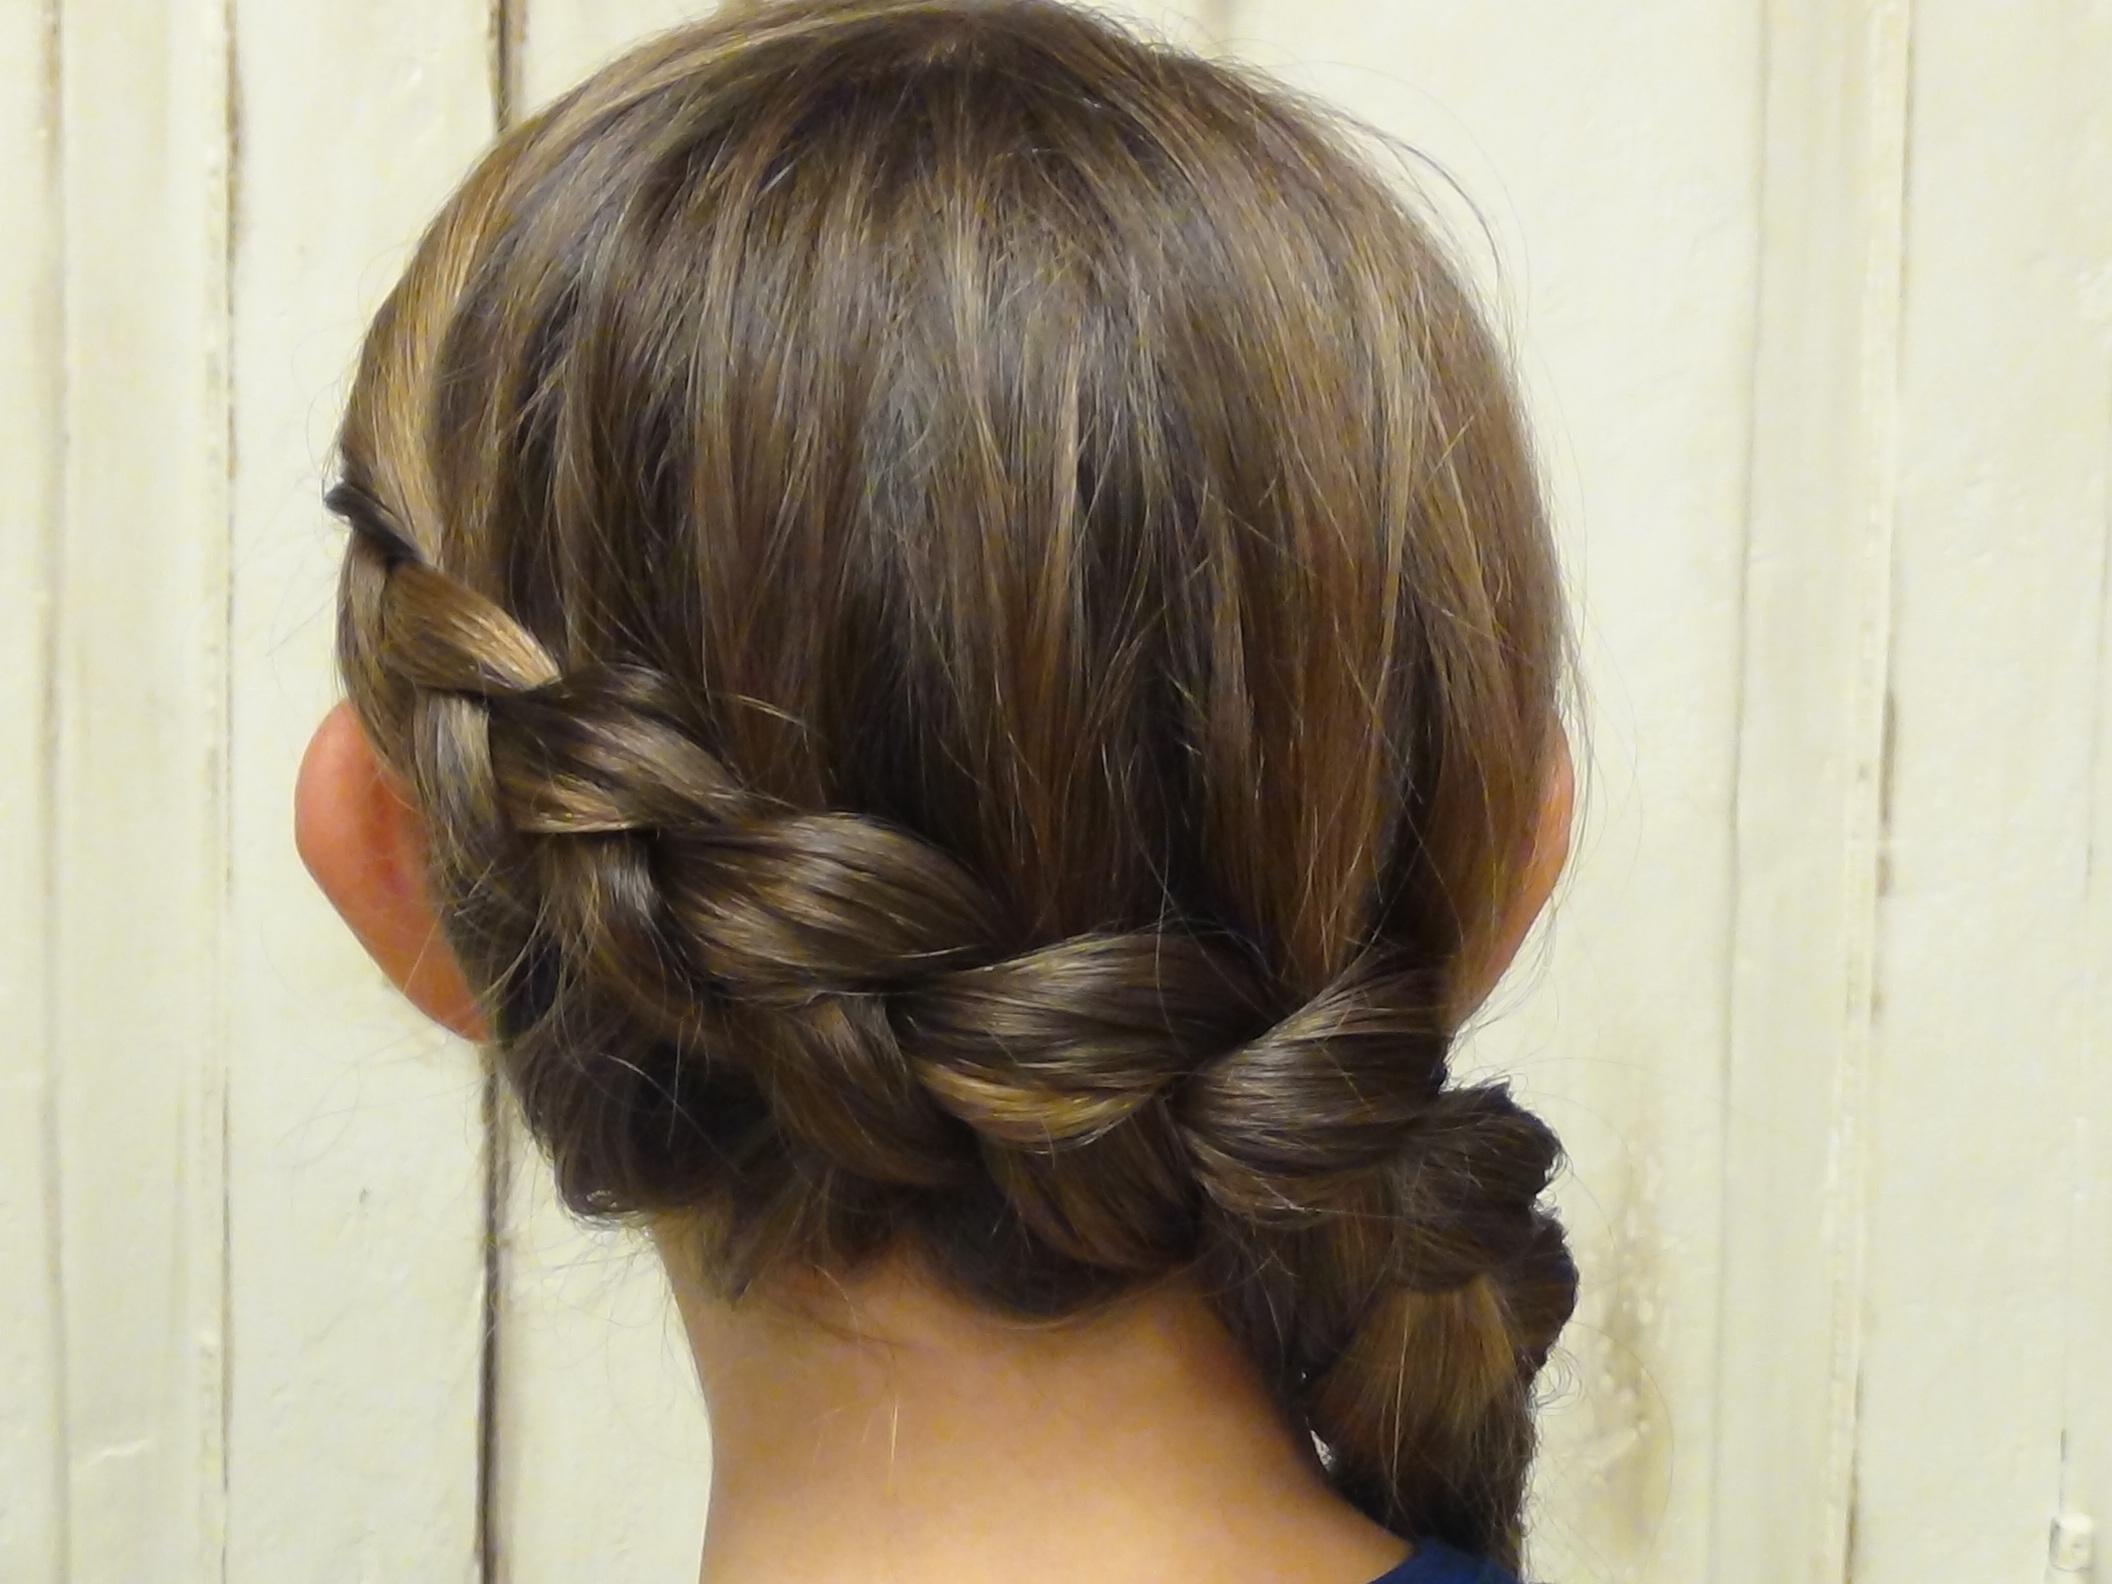 Katniss Everdeen Braid Update | Boys and (Girls Hairstyles)